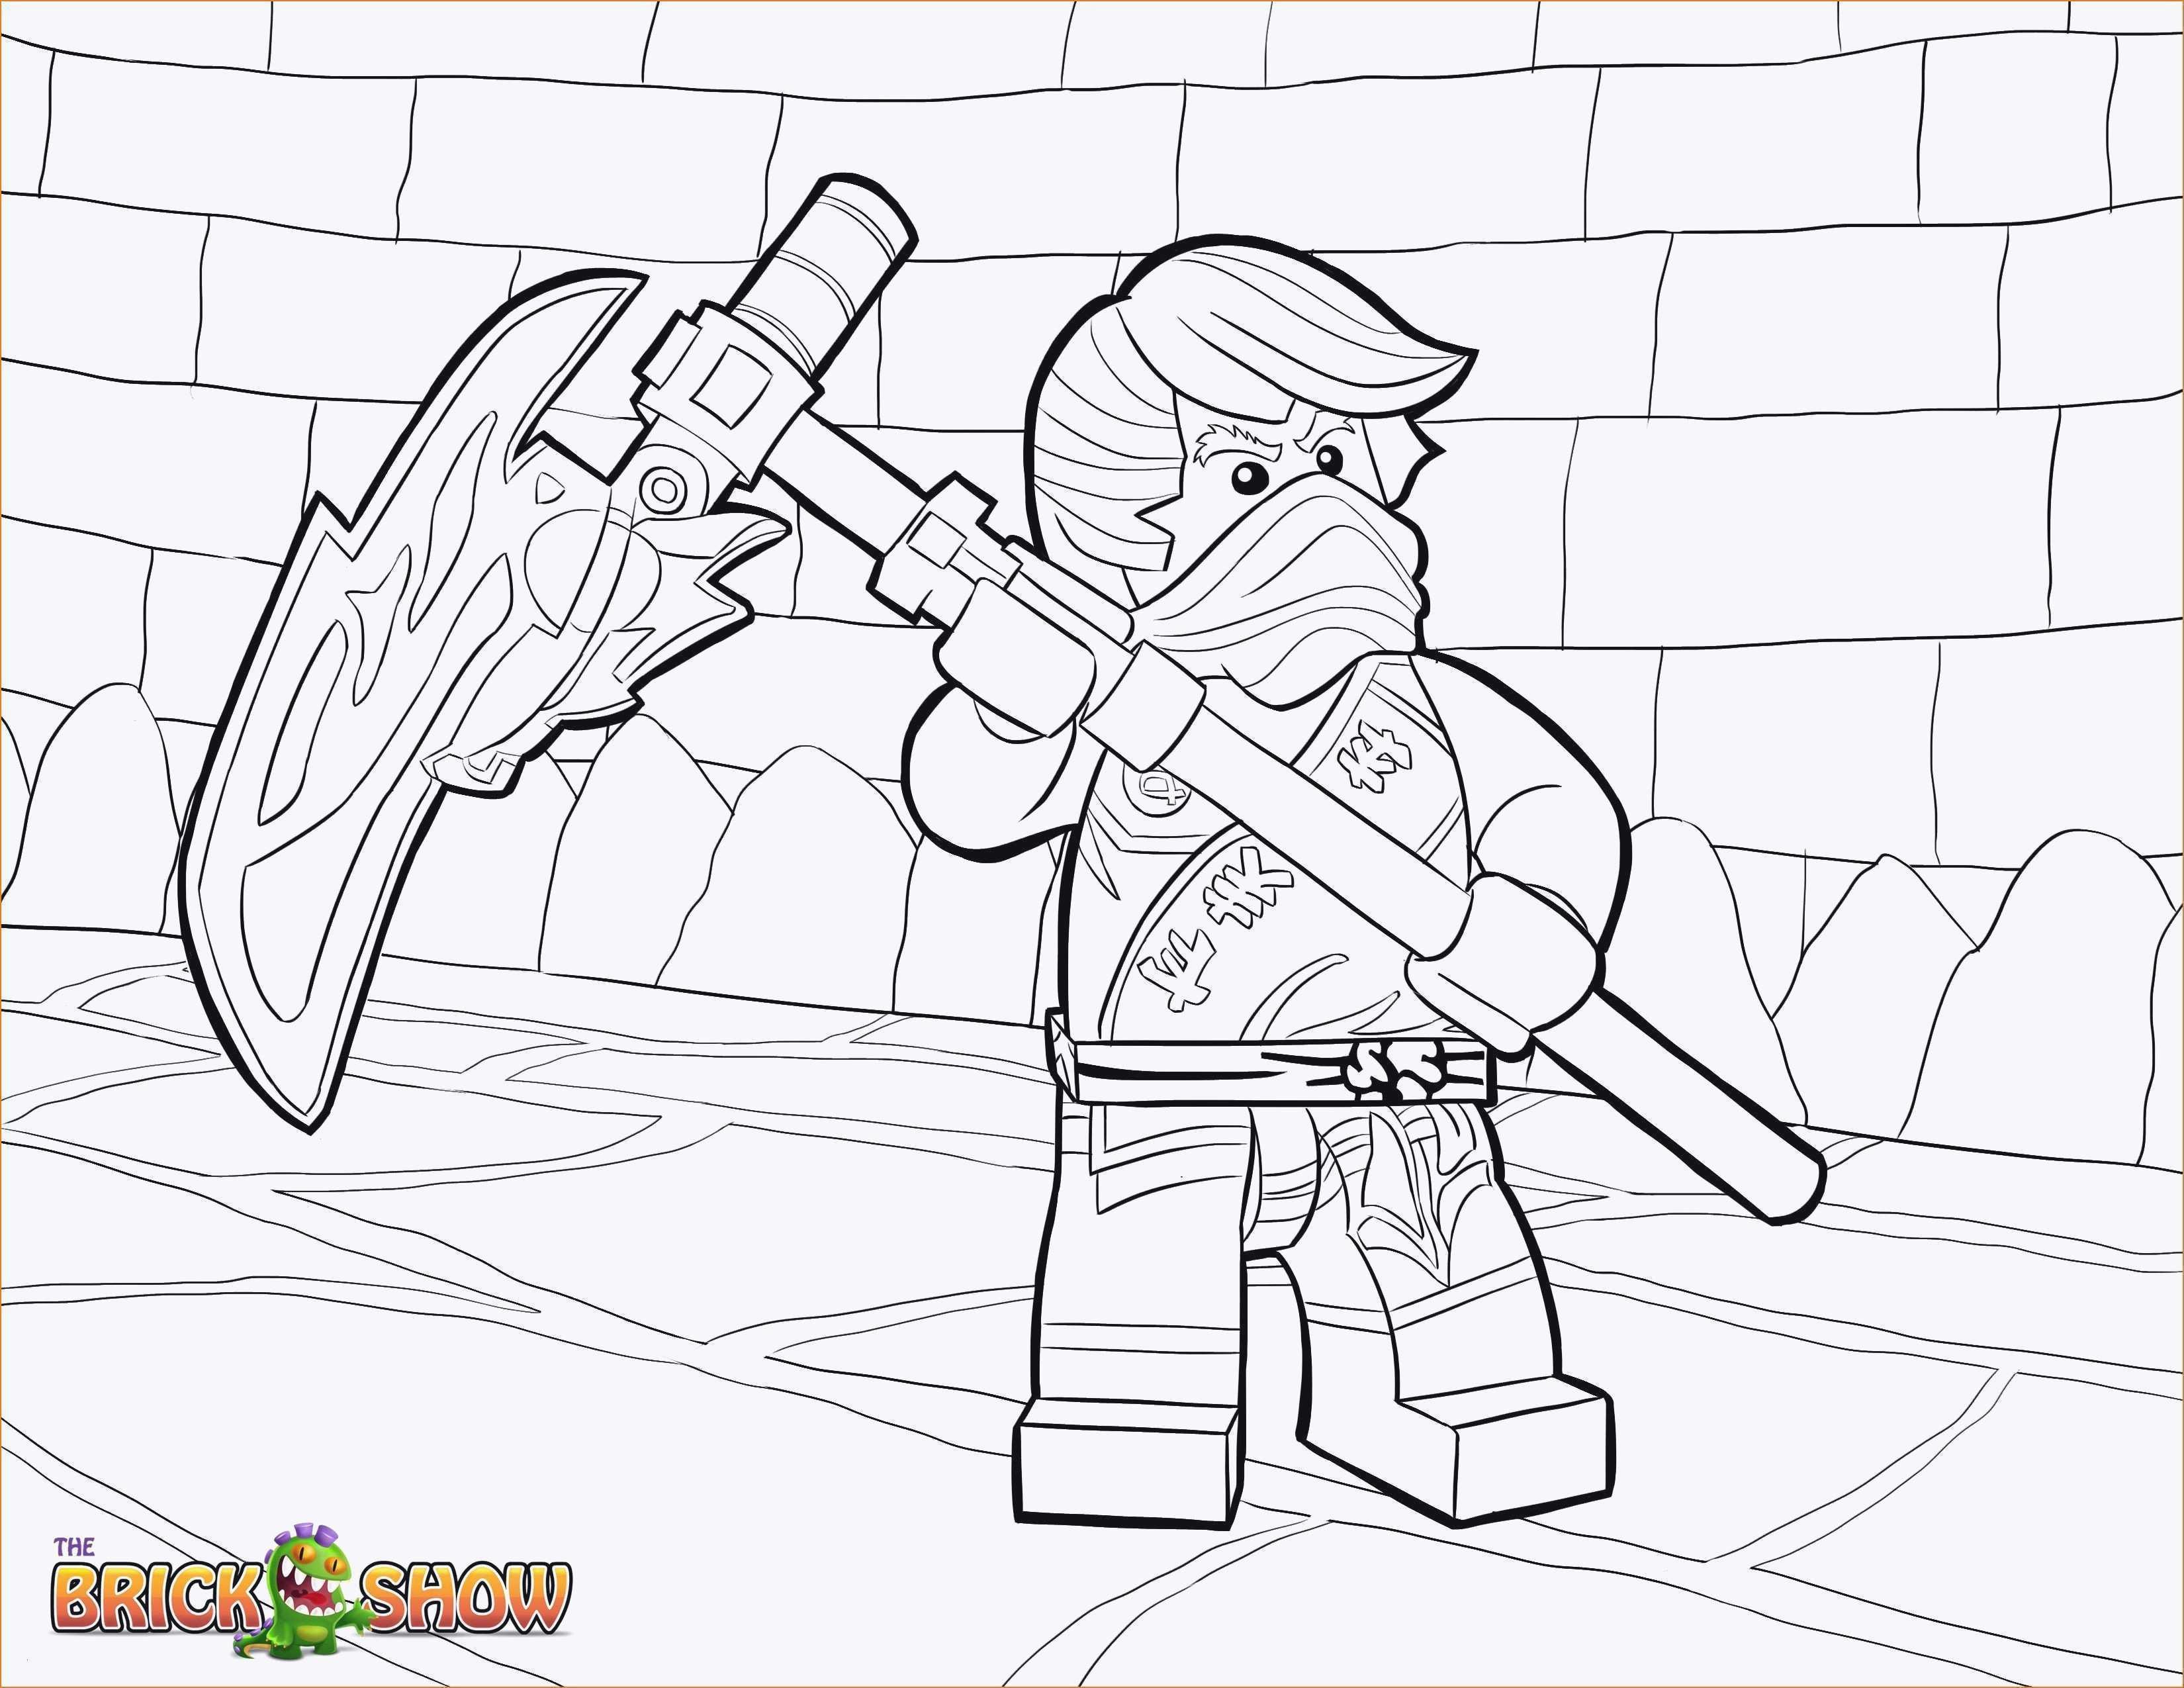 Ninjago Cole Ausmalbilder Genial Lego Ninjago Malvorlagen Luxus Ninjago Cole Ausmalbilder Das Bild